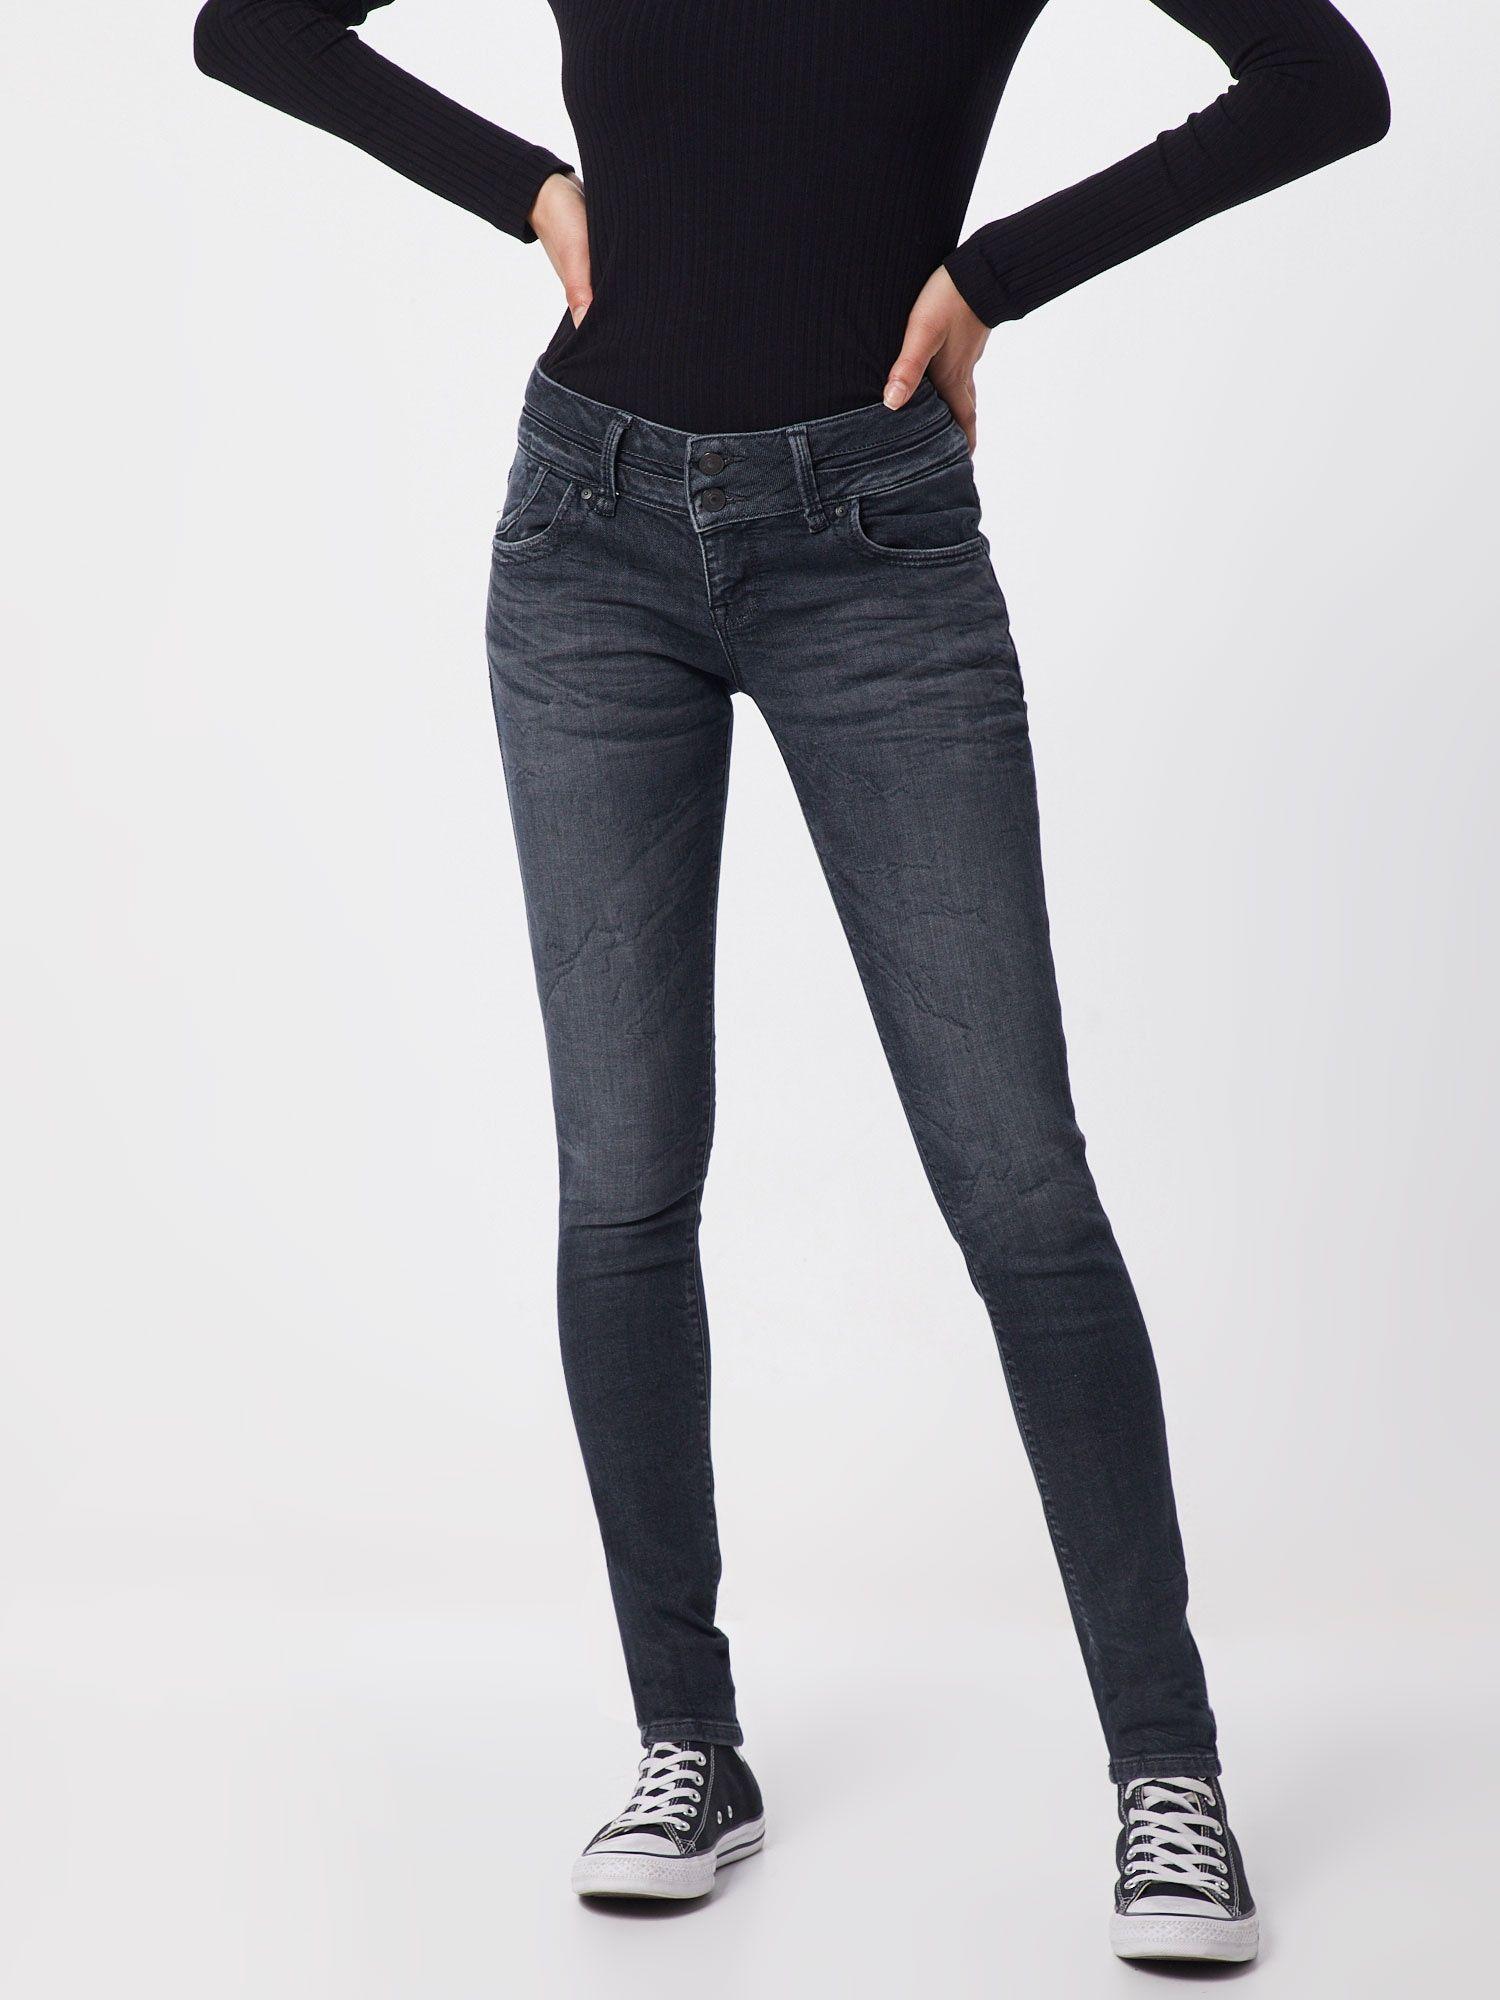 LTB Jeans 'JULITA X' Damen, Grey Denim, Größe 32 | Jeans